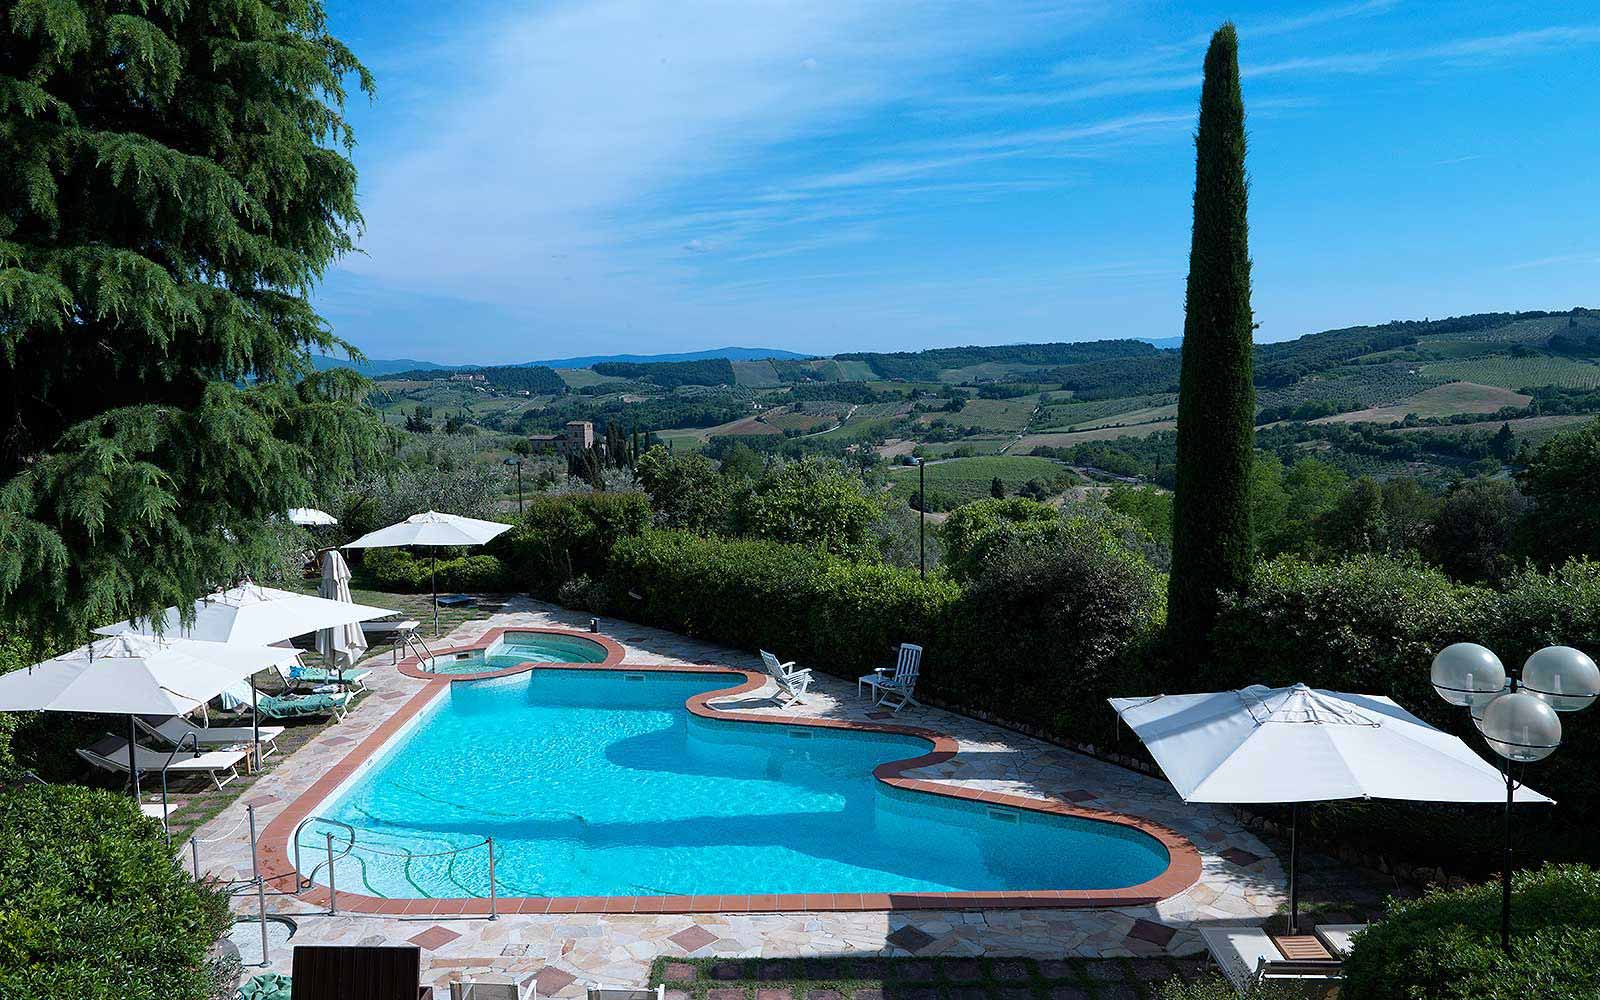 Swimming pool at Relais Santa Chiara